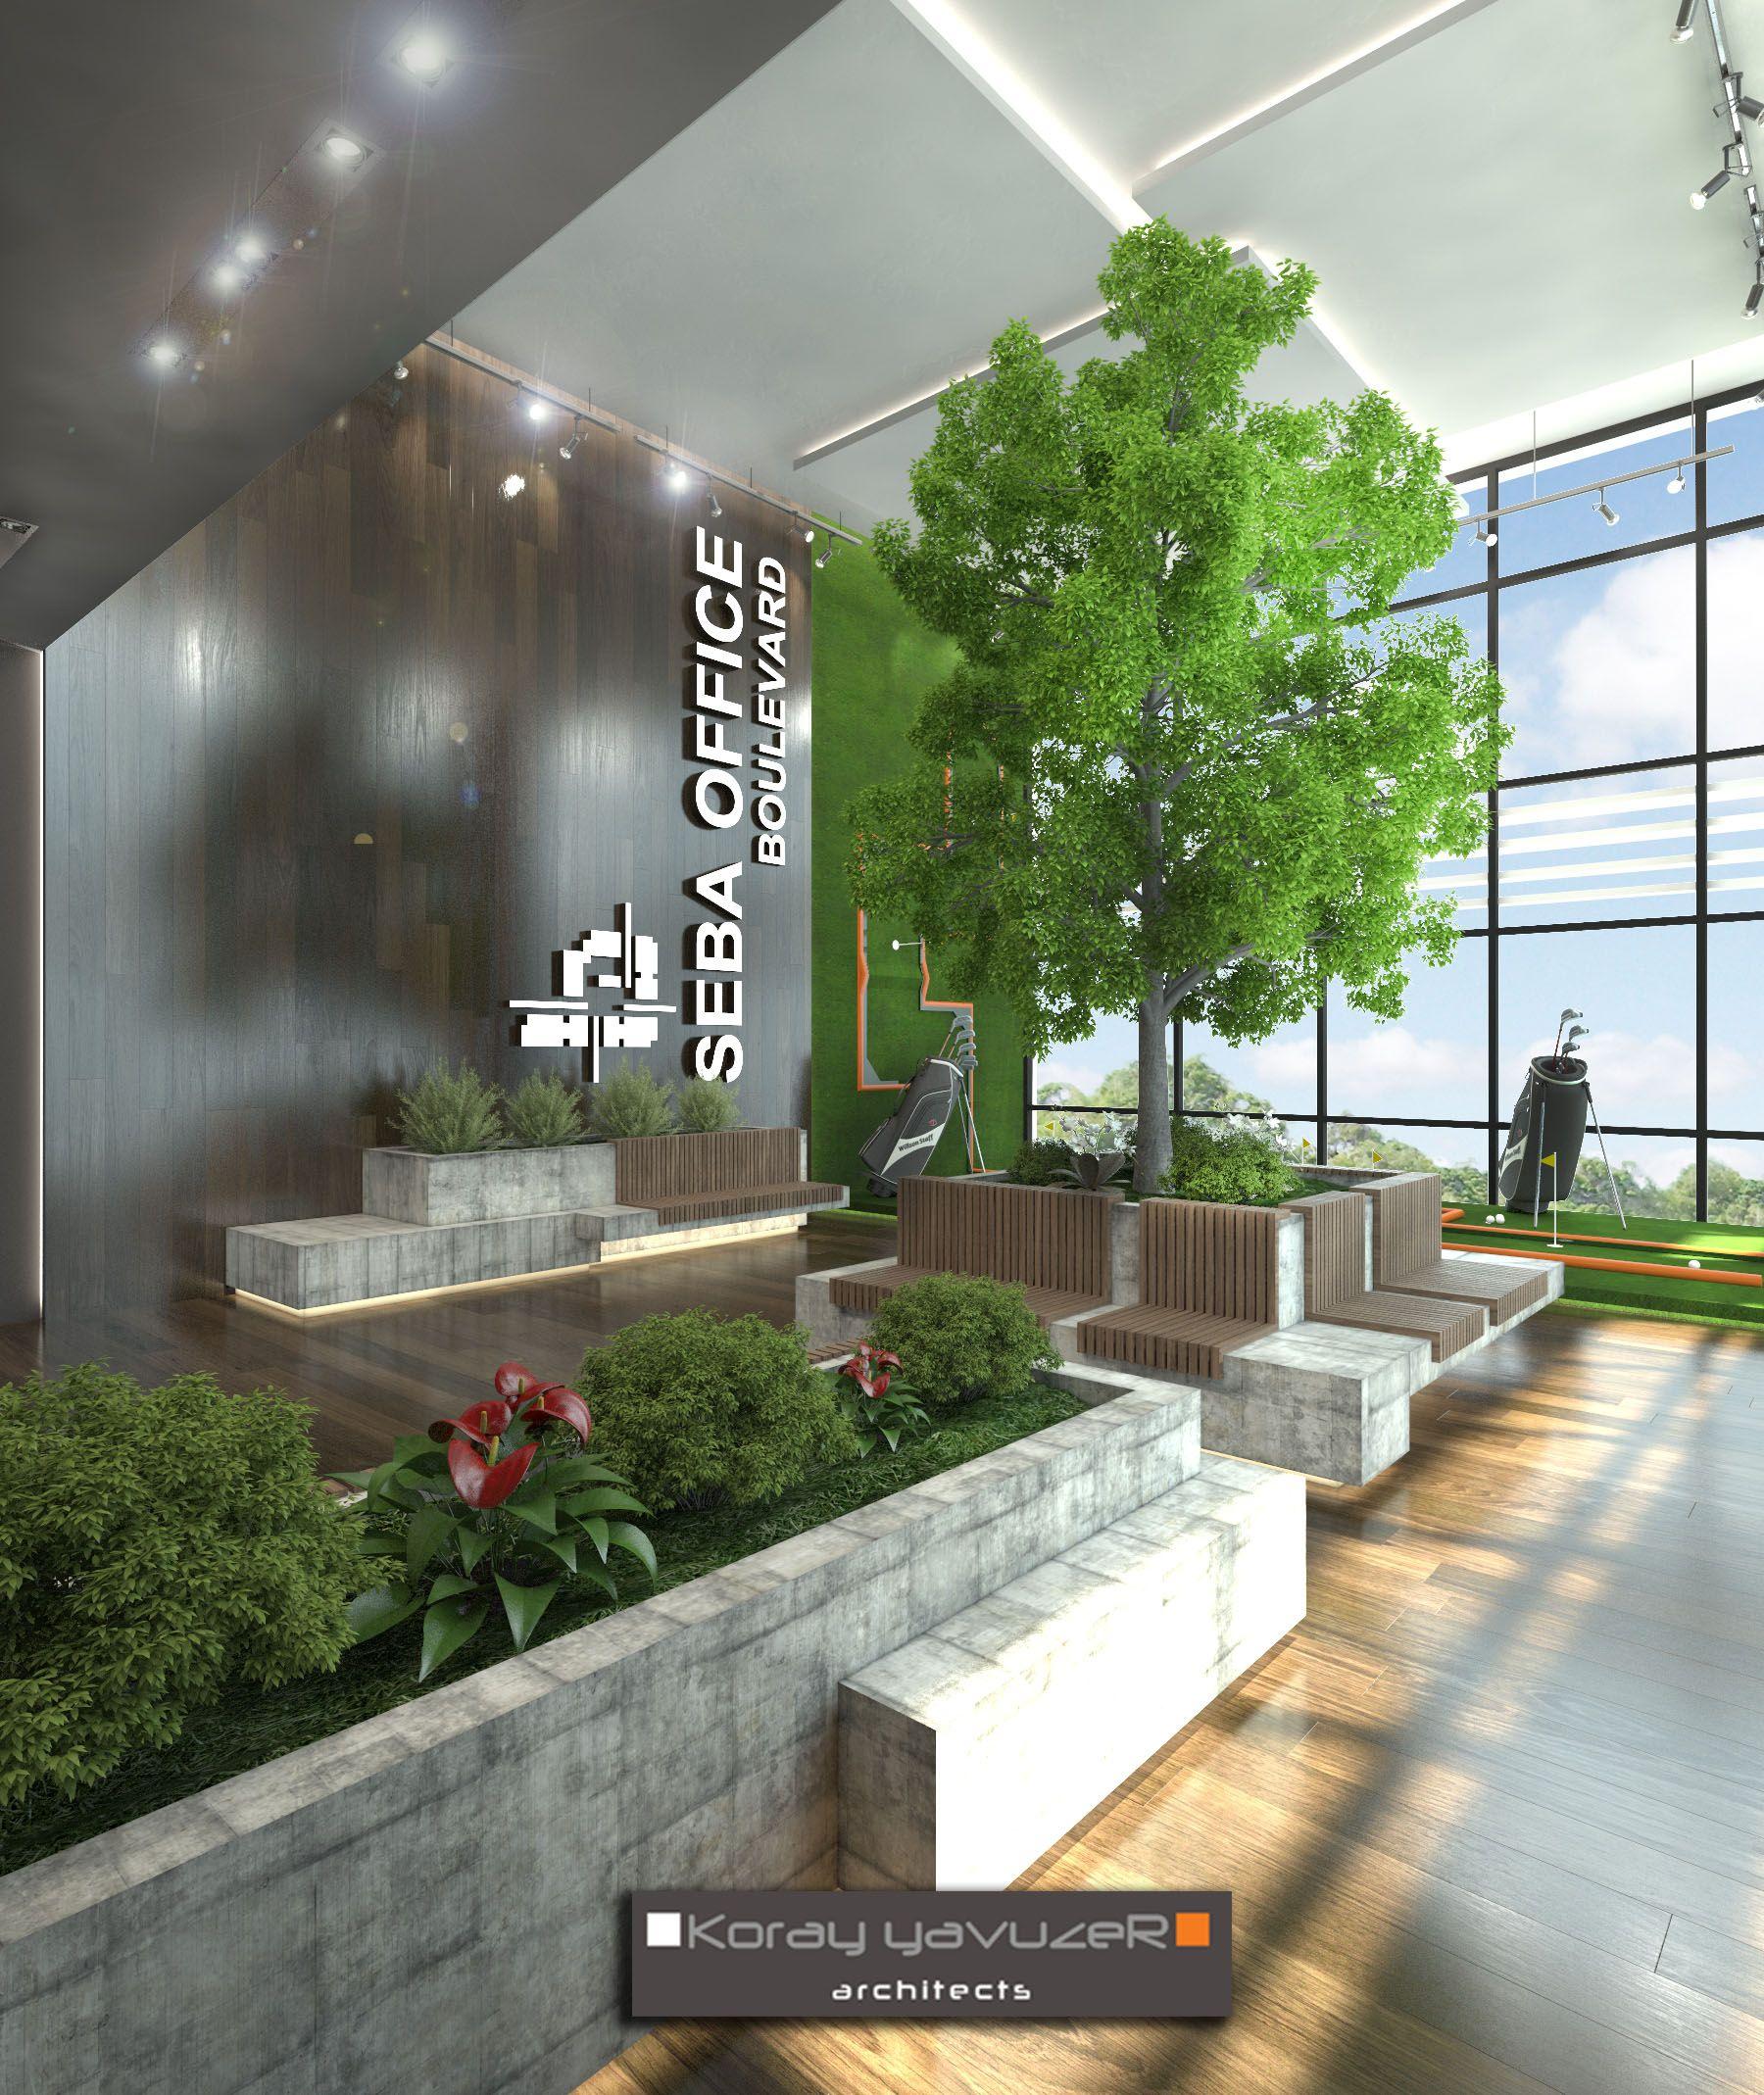 51 Modern Living Room Design From Talented Architects: Seba Office Boulvard Publıc Areas Cendere